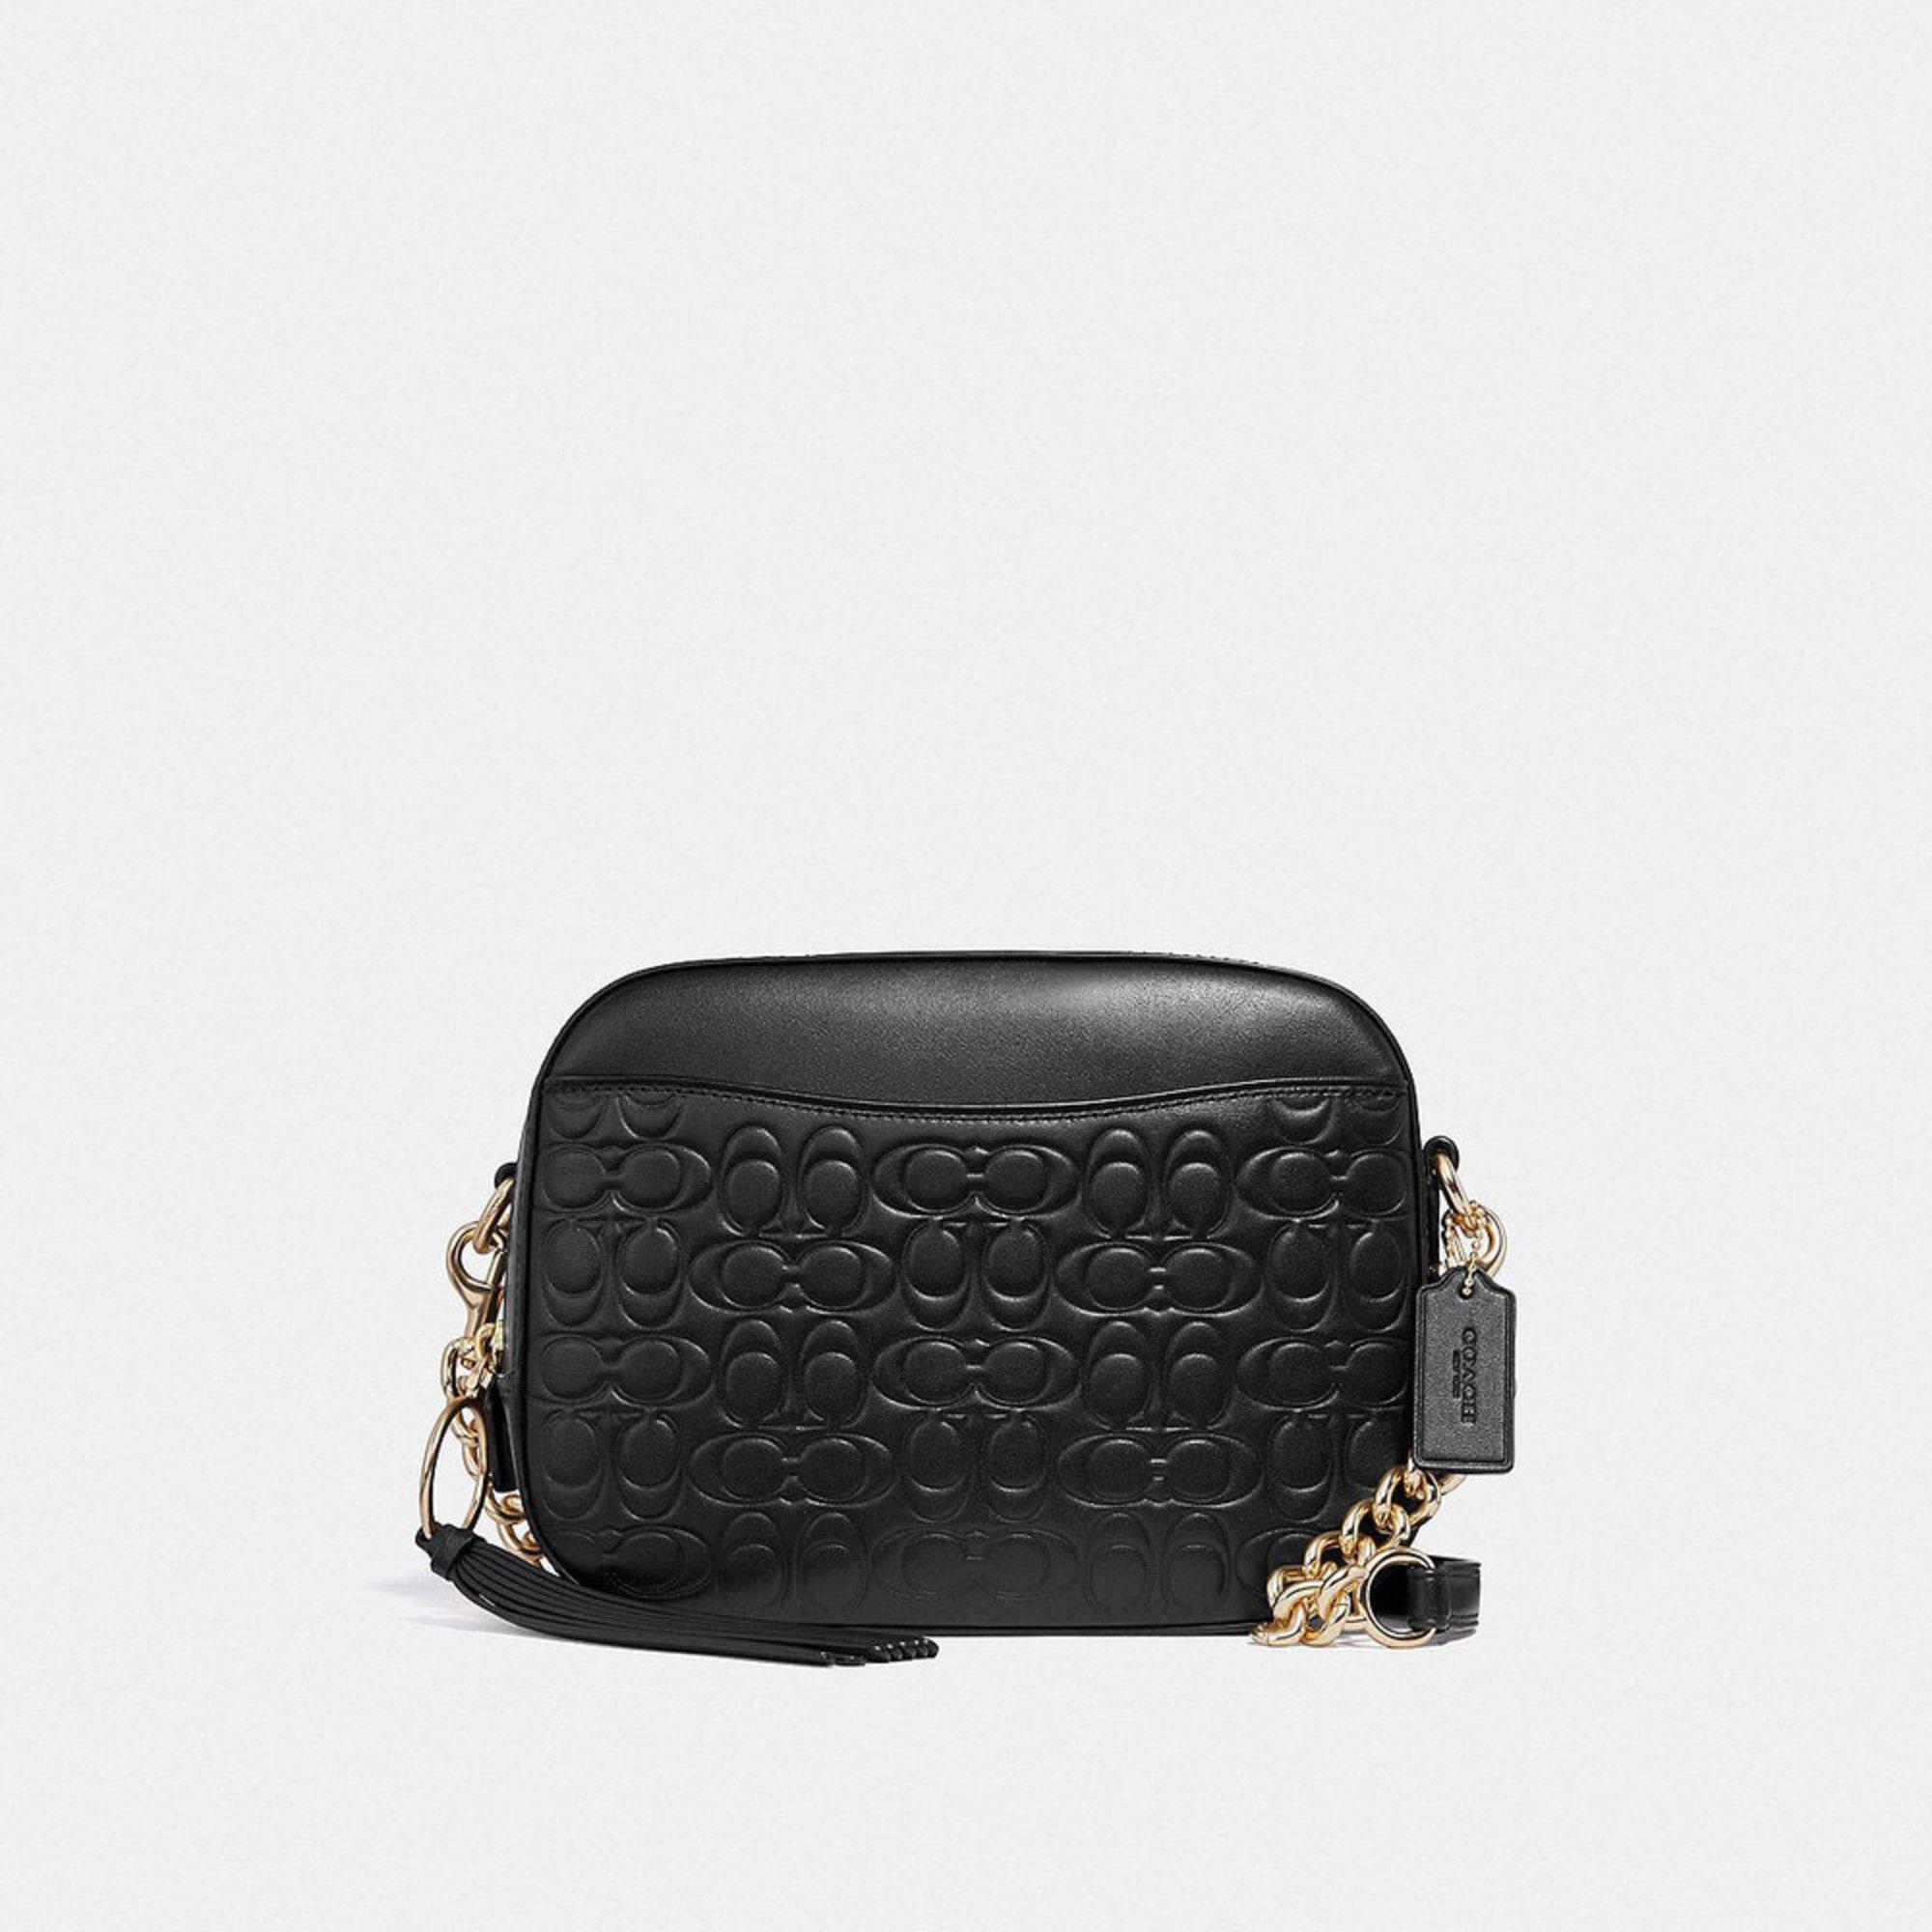 Coach Signature Leather Camera Bag